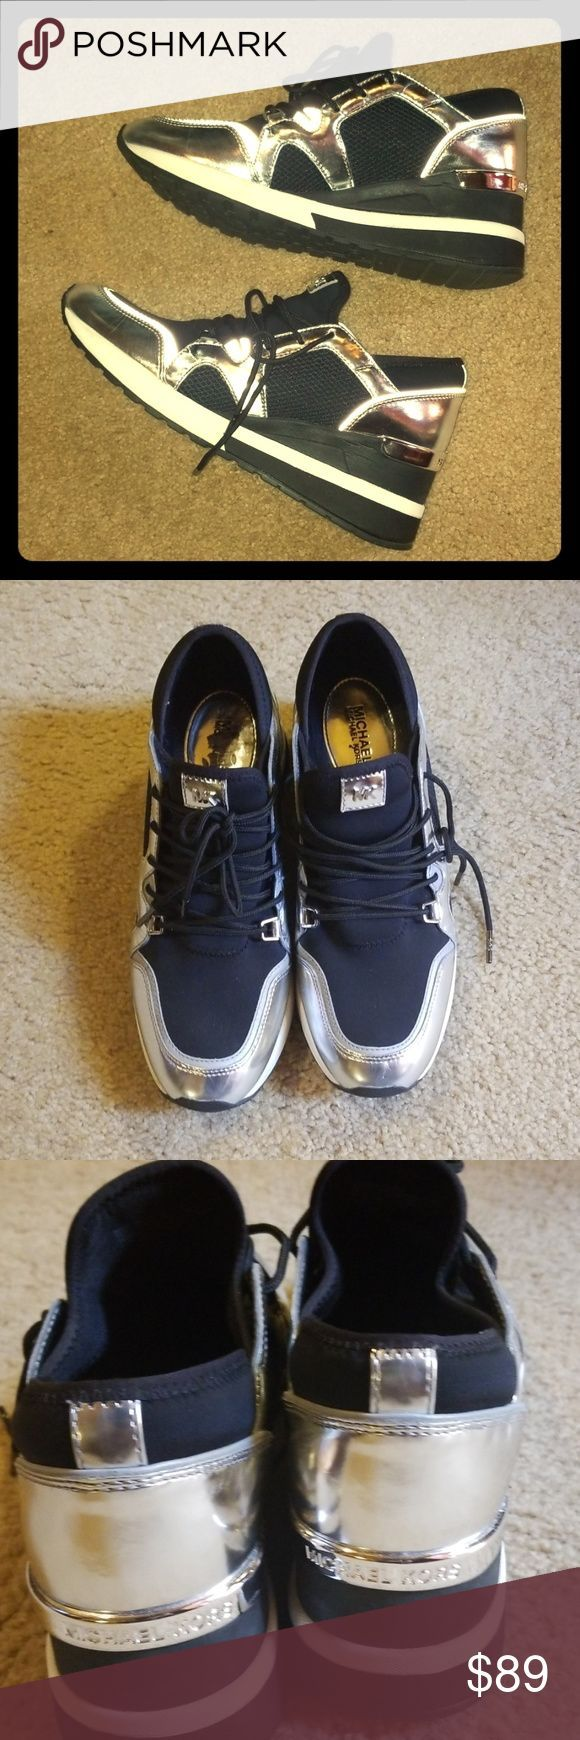 Michael Kors MK Sneakers MK Liv lace up Trainers in blacksilver metallic EUC on Michael Kors MK Sneakers MK Liv lace up Trainers in blacksilver metallic EUC on